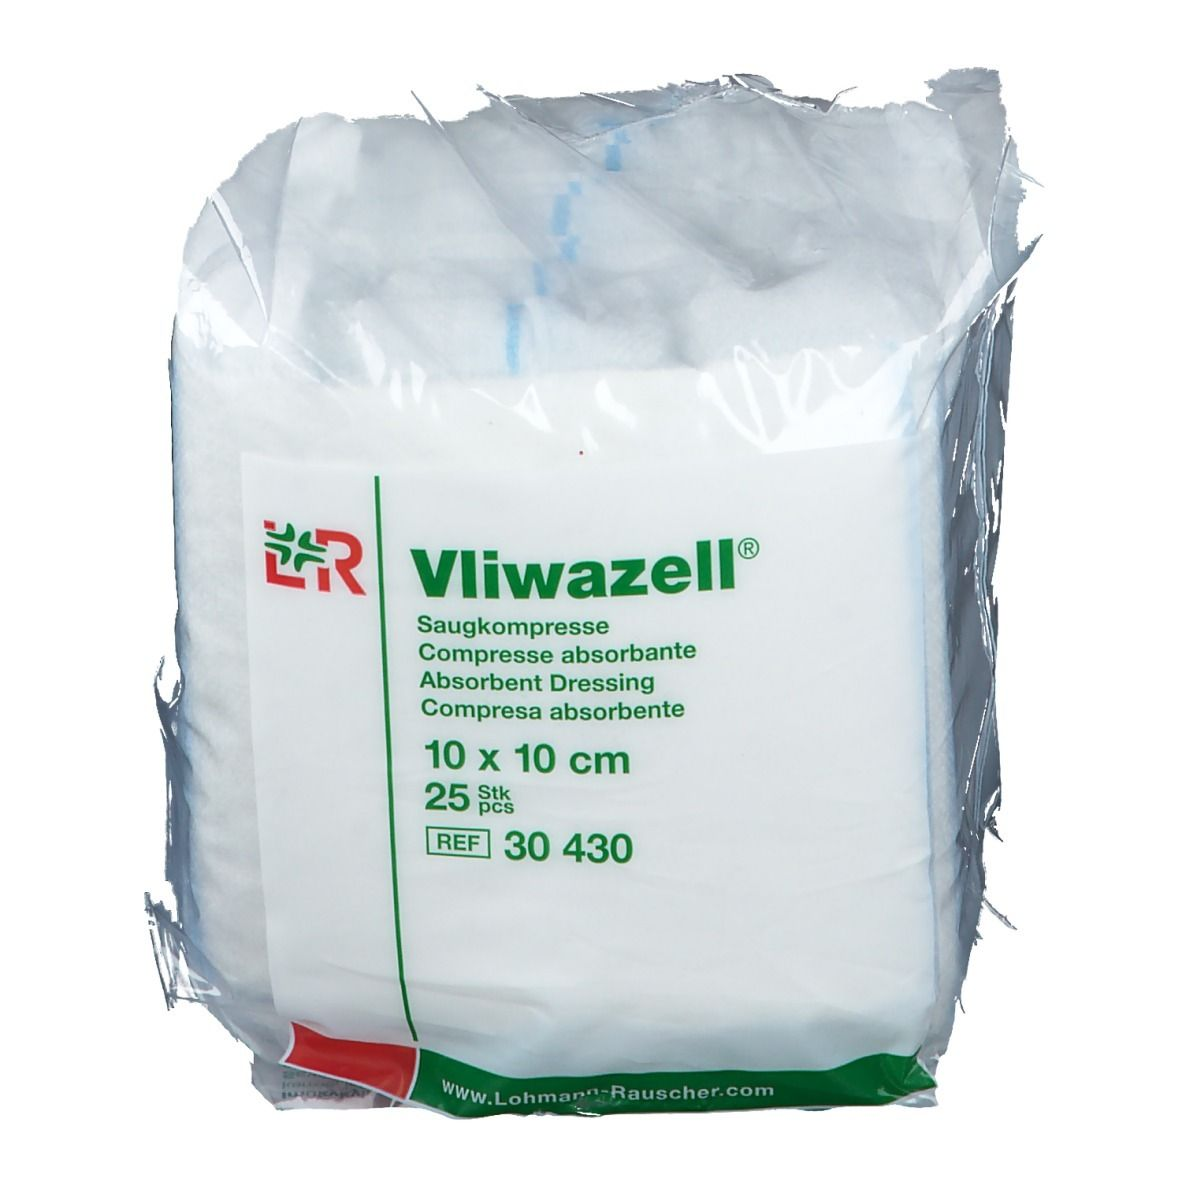 Vliwazell® Kompressen 10 x 10 cm unsteril